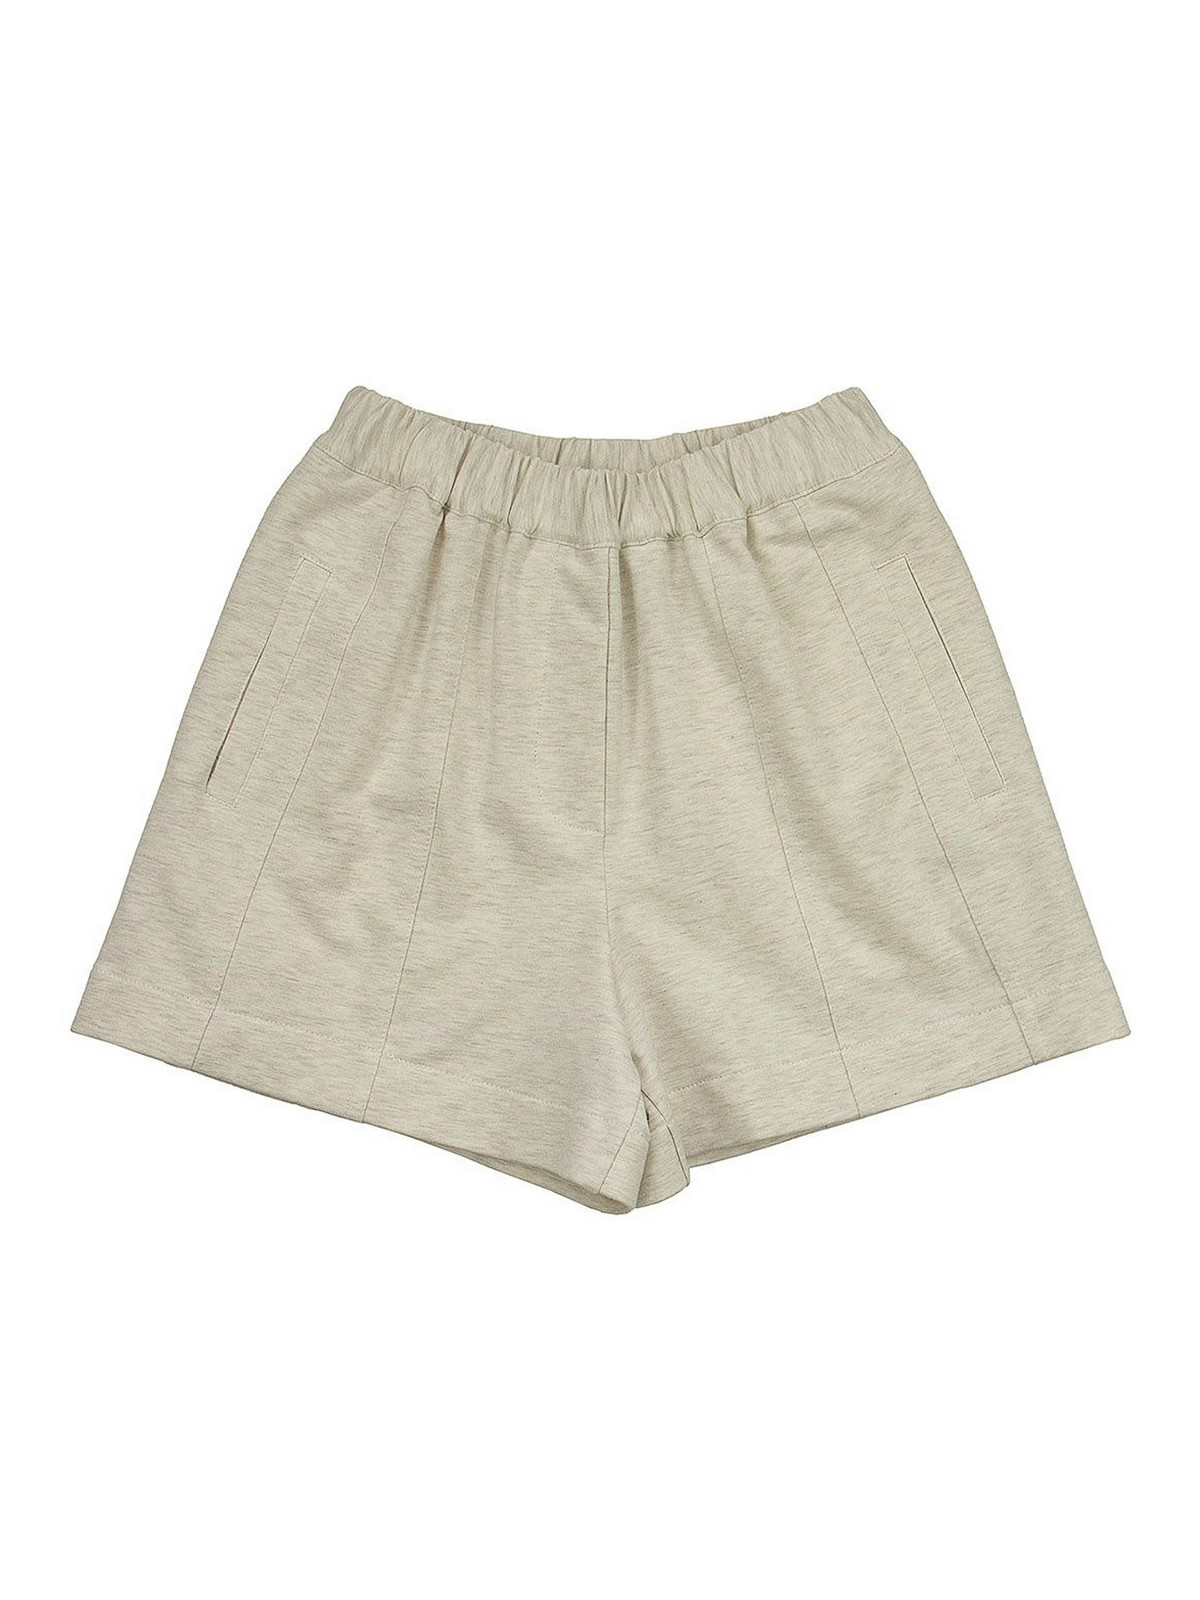 Brunello Cucinelli Shorts STRETCH COTTON TERRY CLOTH SHORTS